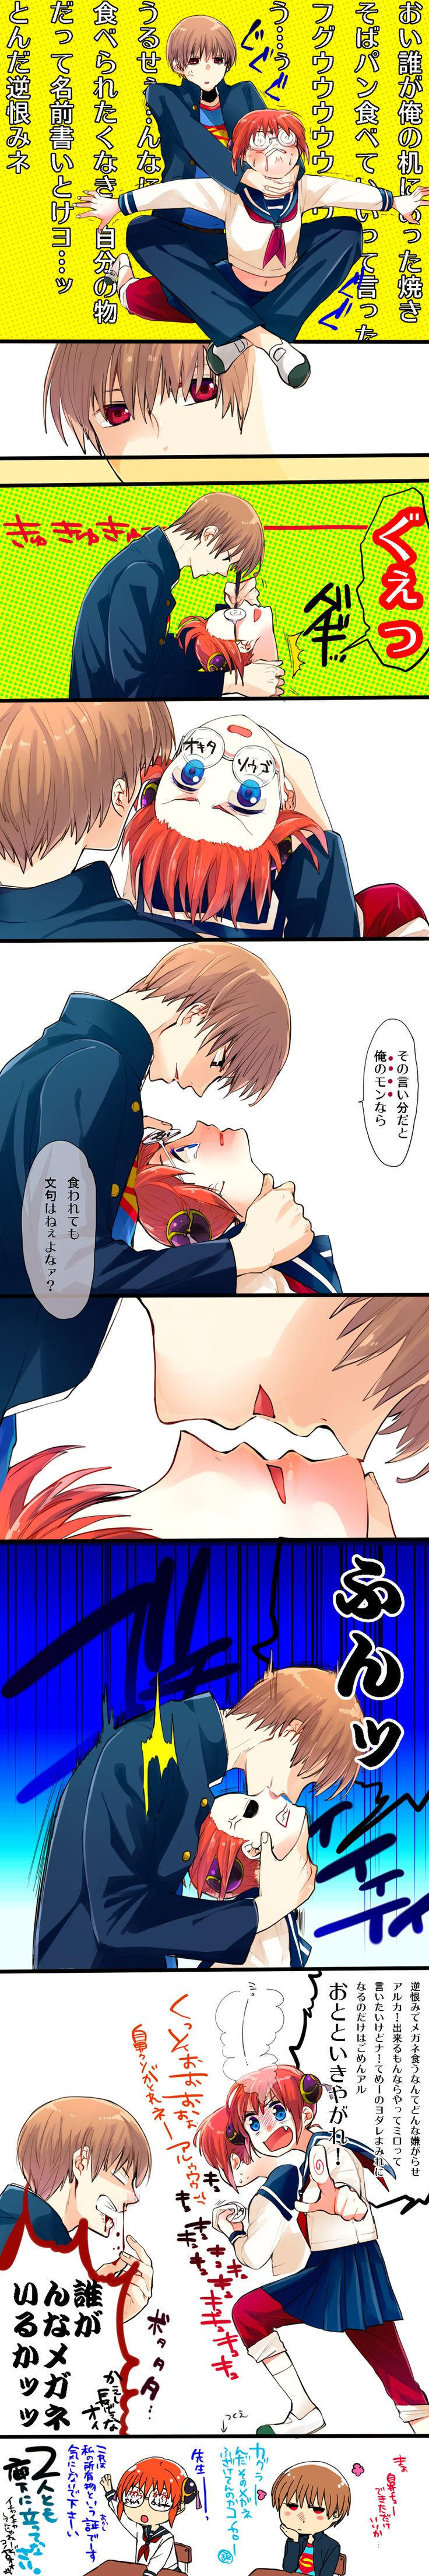 Gin Tama, Kagura (Gin Tama), Okita Sougo, Nosebleed, Almost Kiss